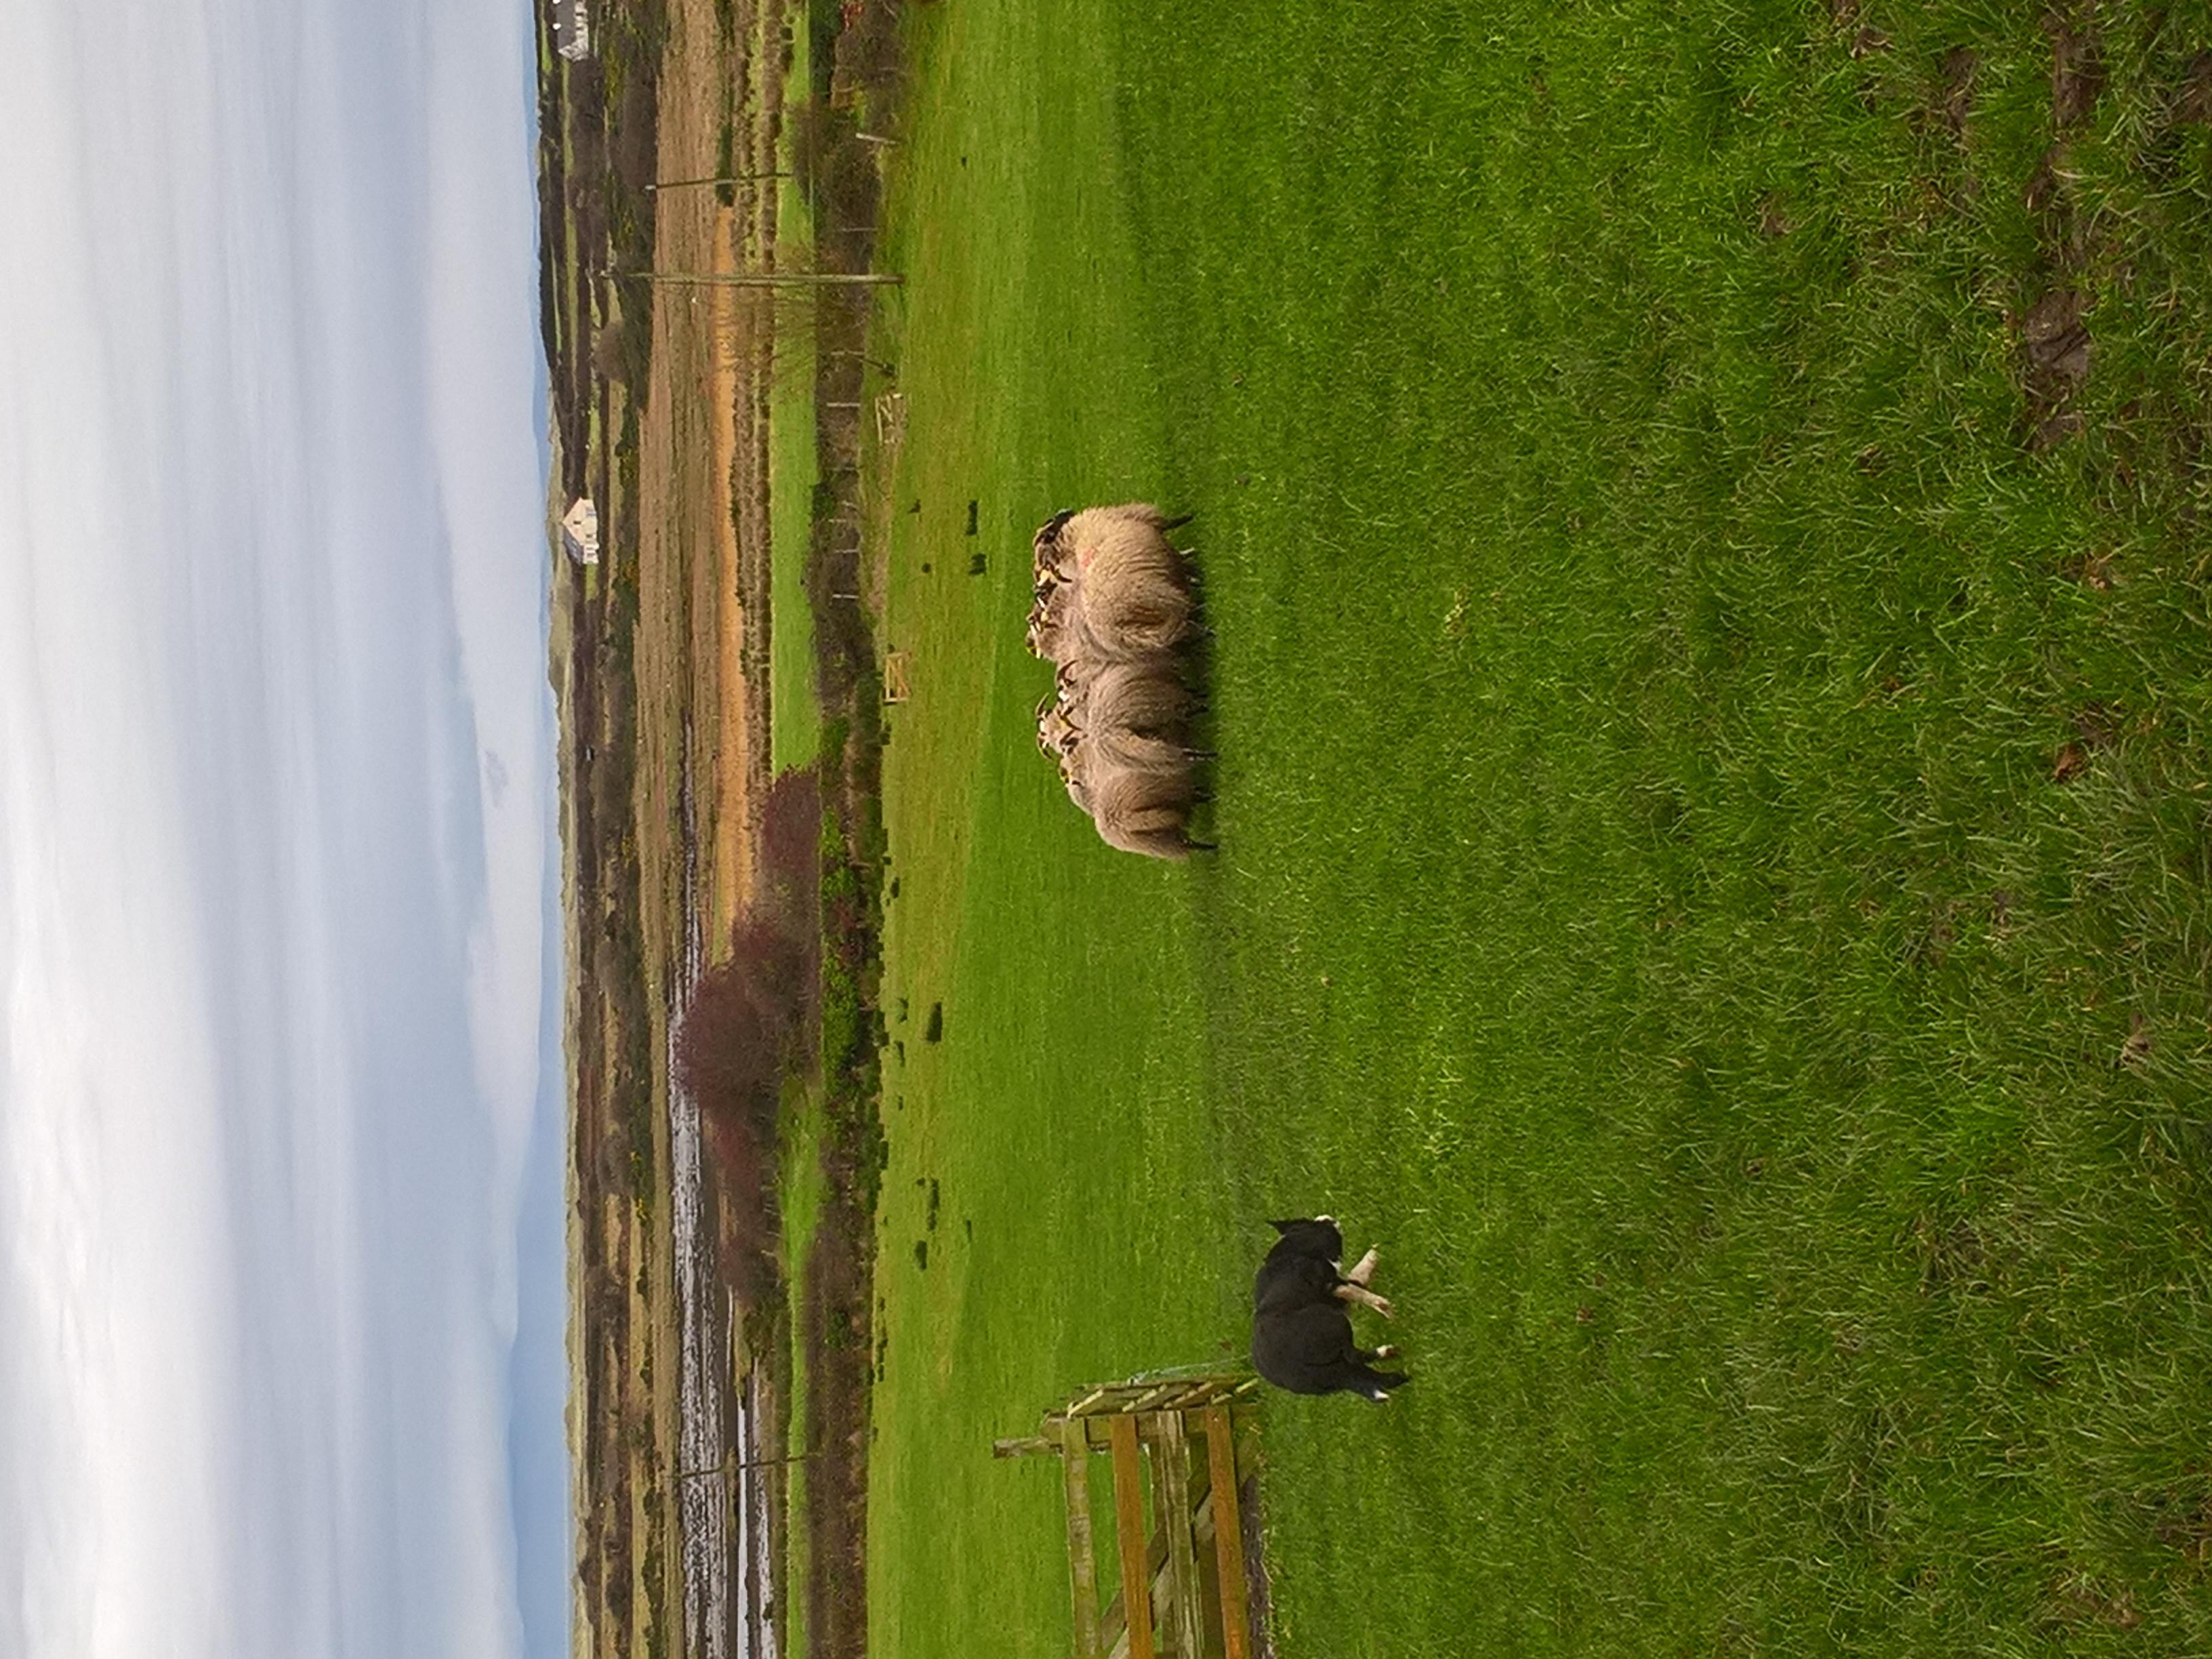 Atlantic Sheepdogs